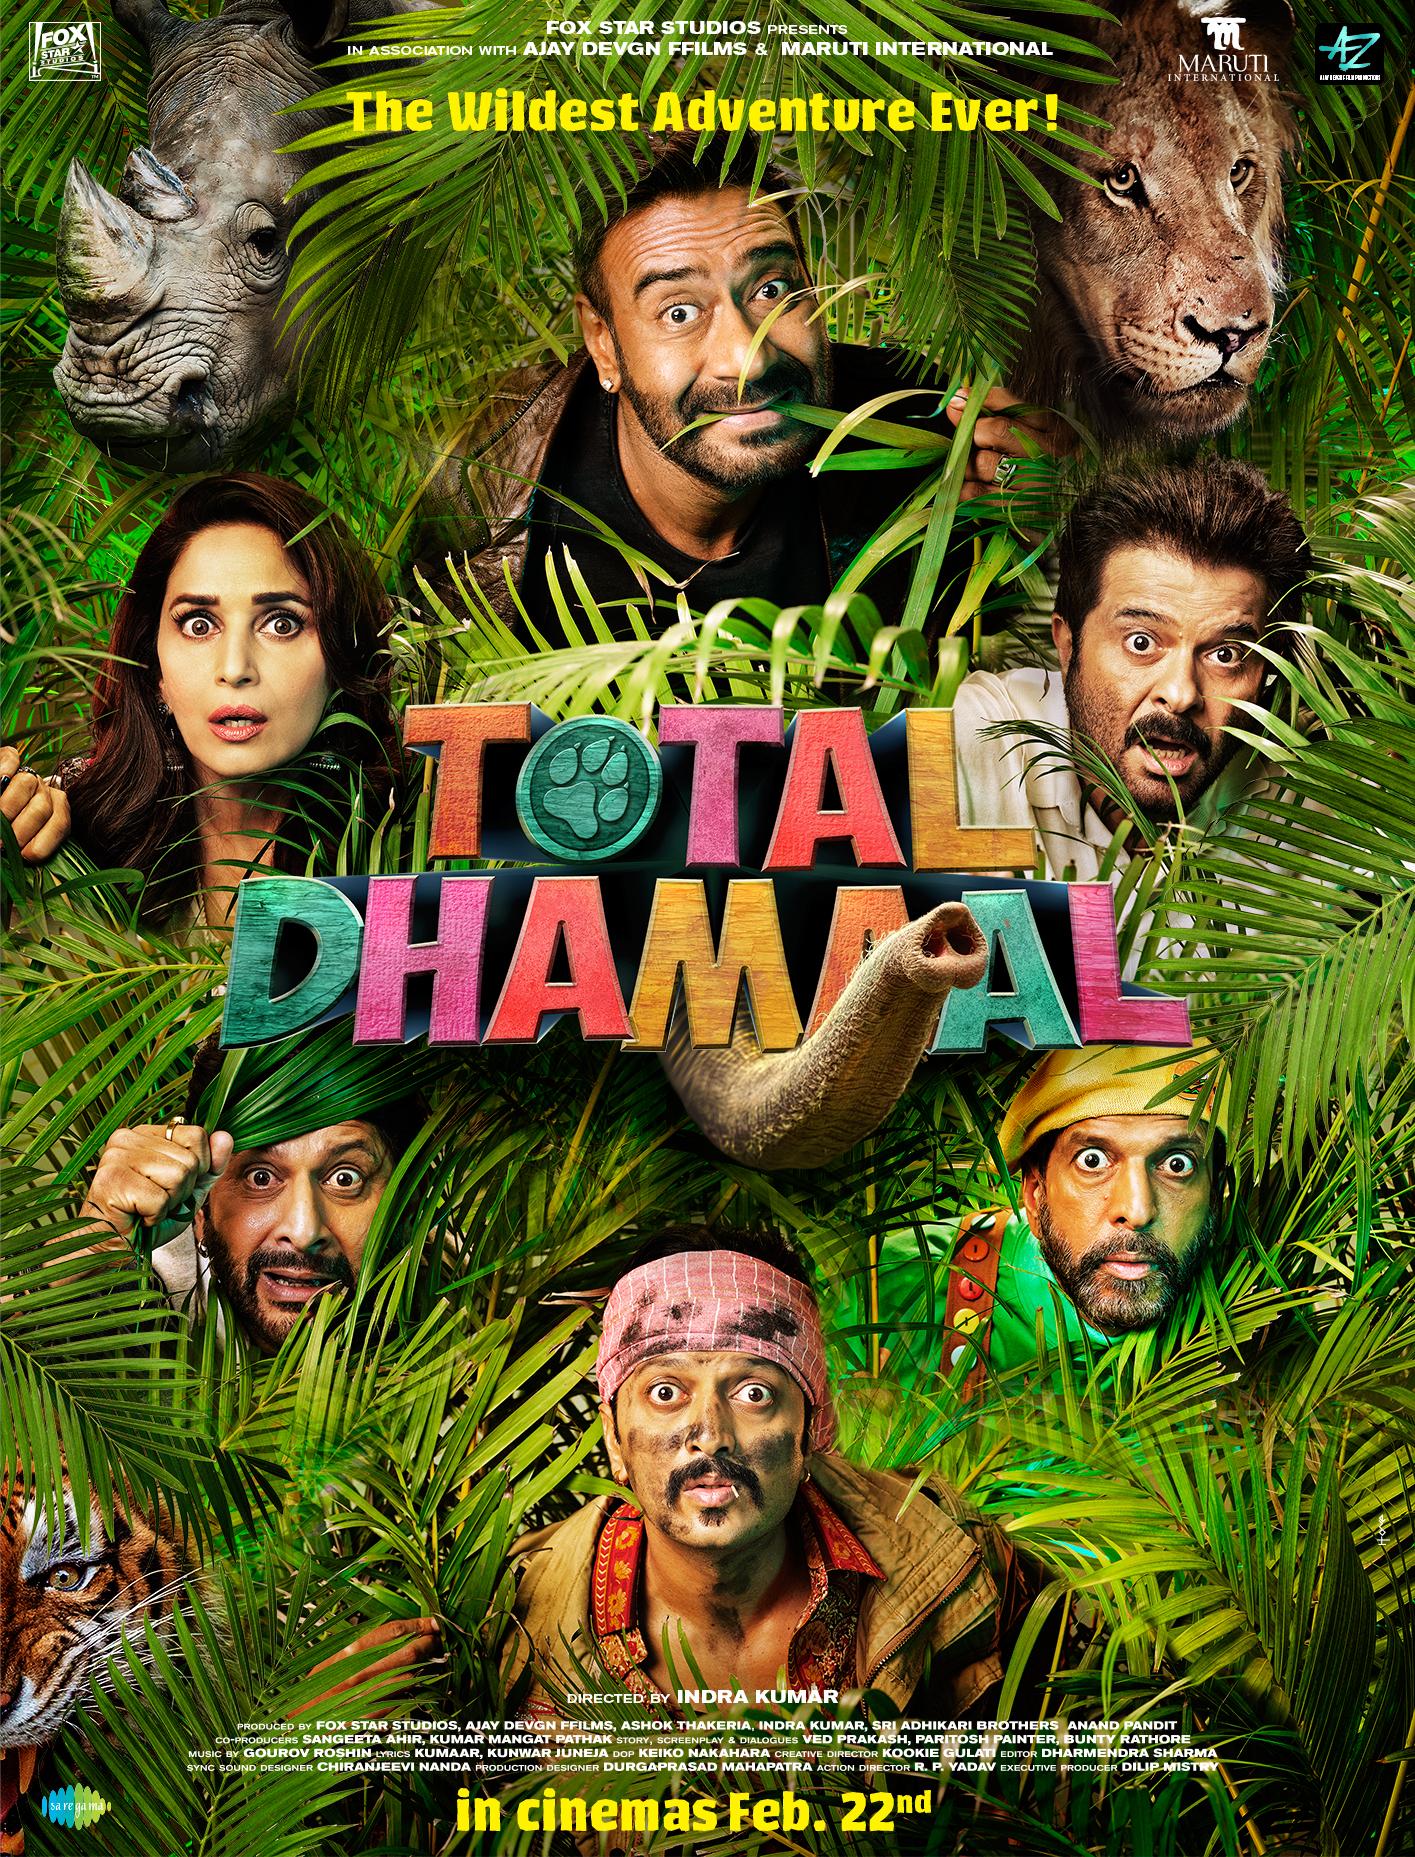 Madhuri Dixit, Ajay Devgn, Javed Jaffrey, Anil Kapoor, Arshad Warsi, and Riteish Deshmukh in Total Dhamaal (2019)